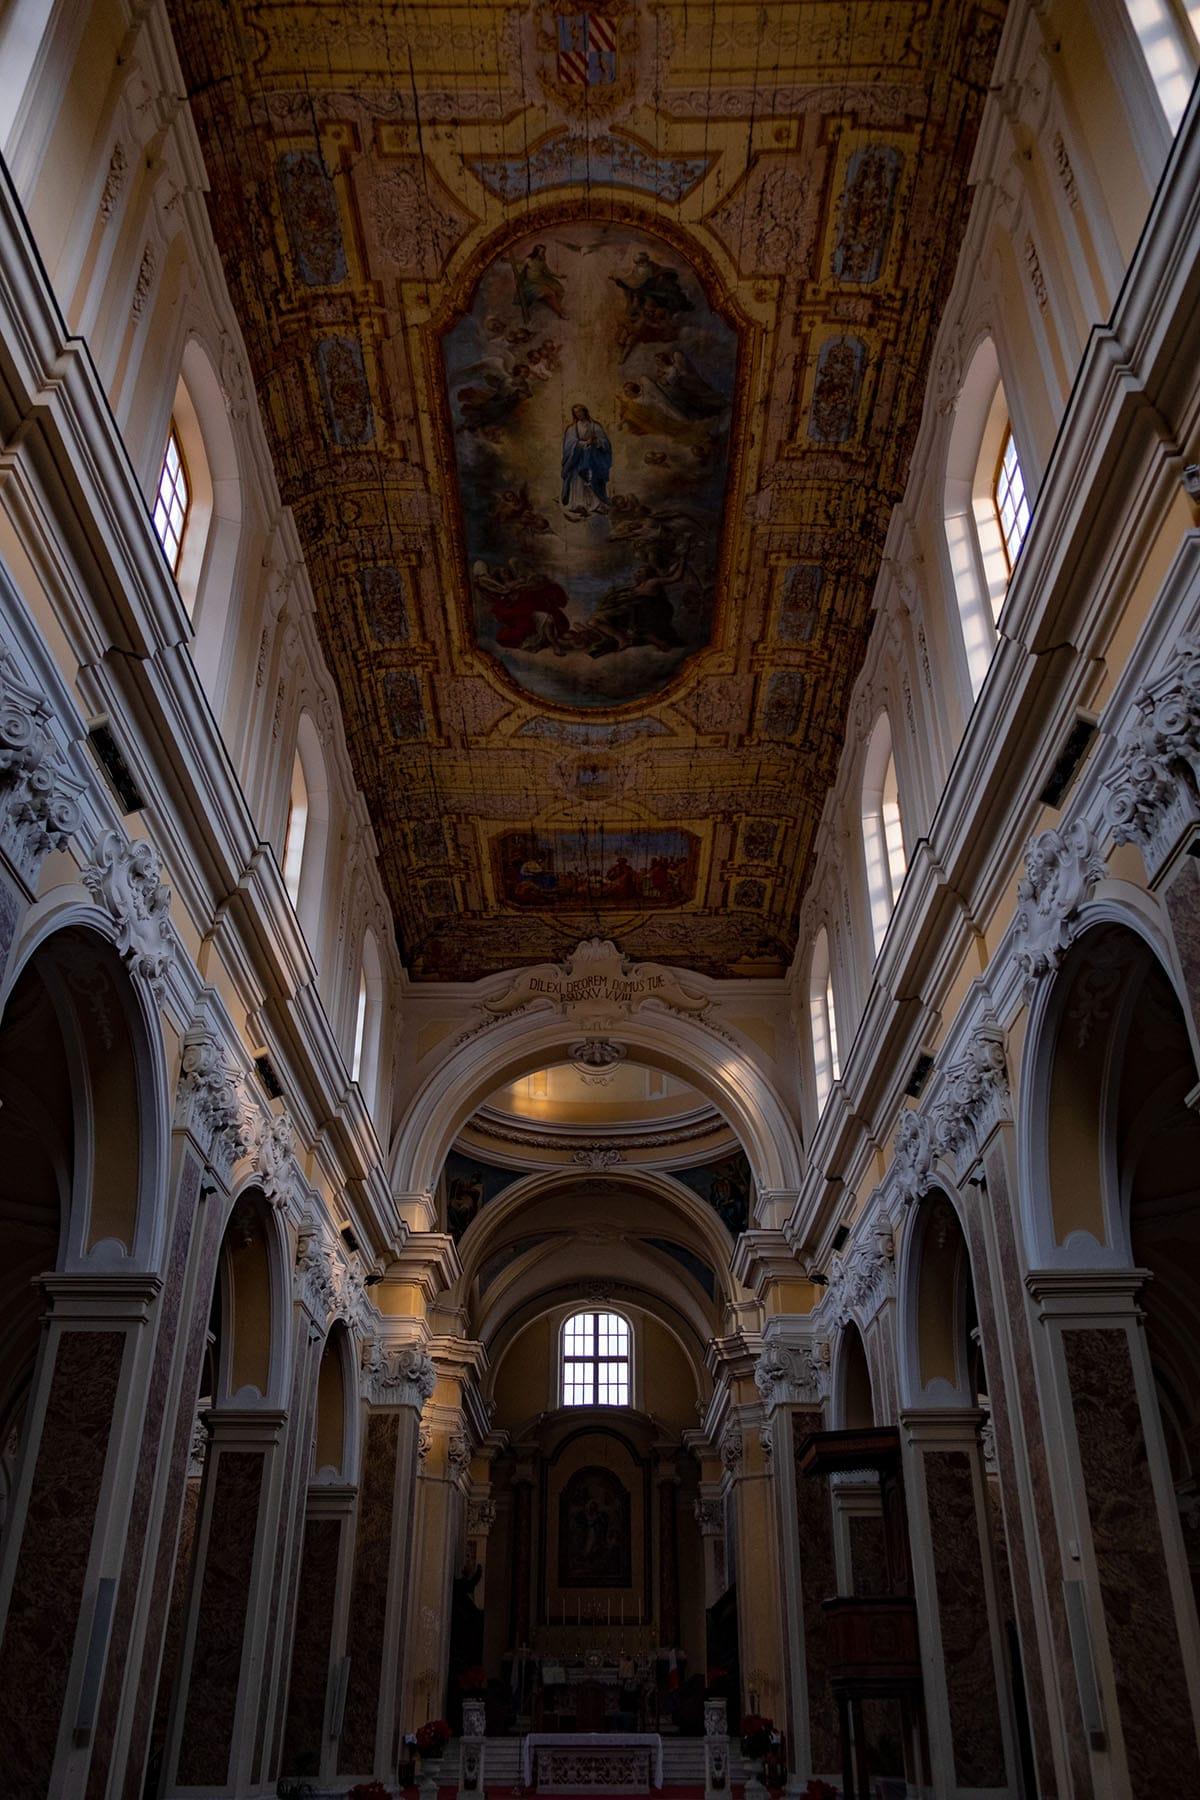 Interno Duomo Sant'Agata de'Goti